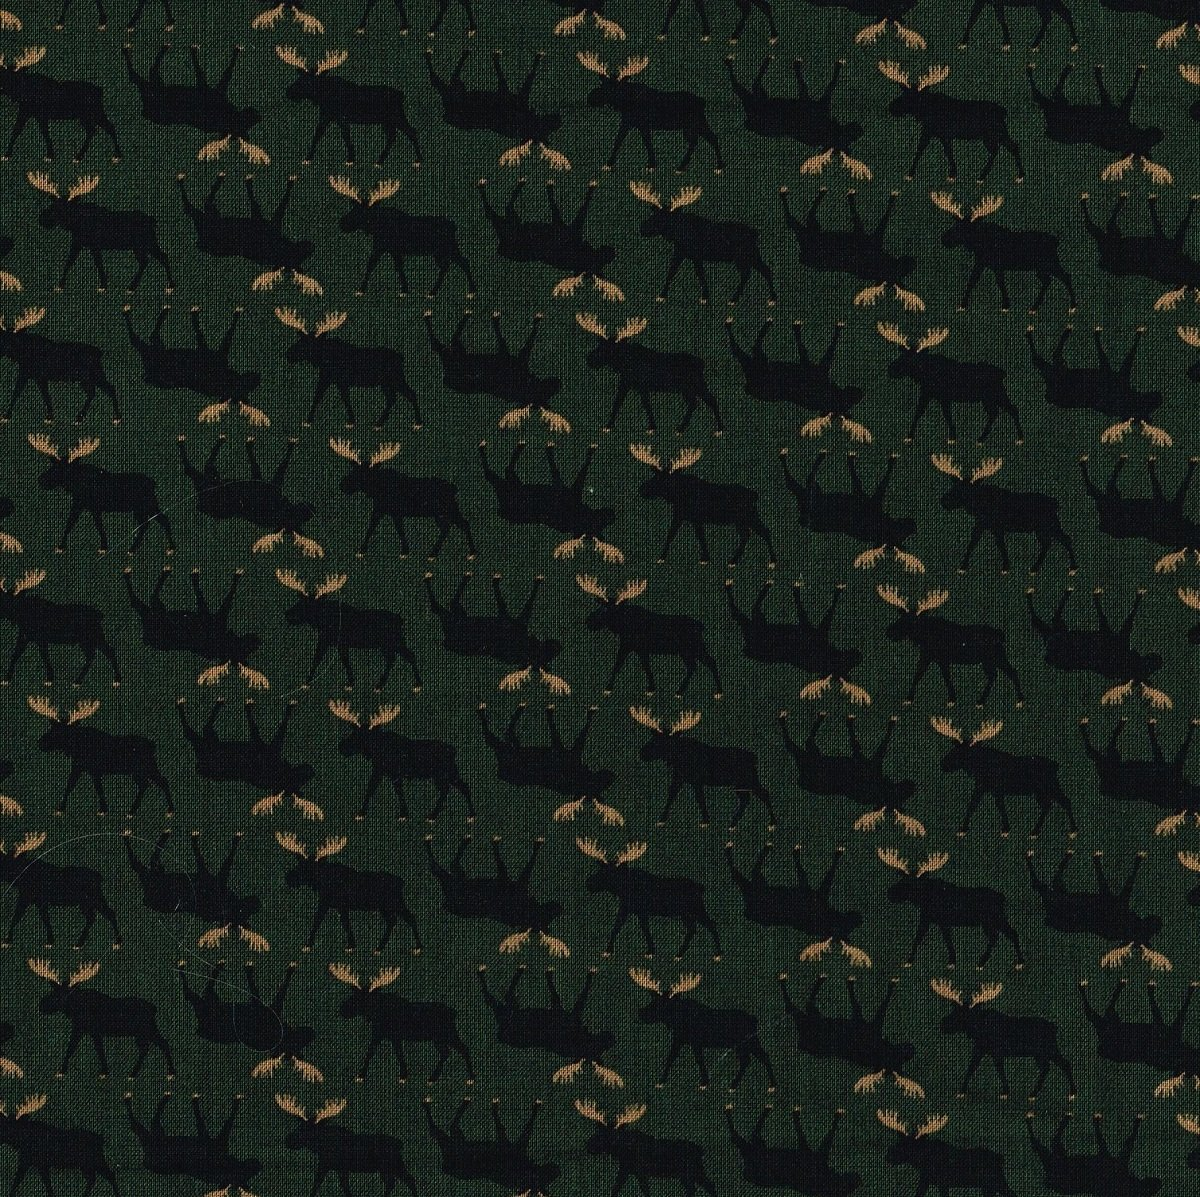 Mini Moose Green TT C1719 Pine